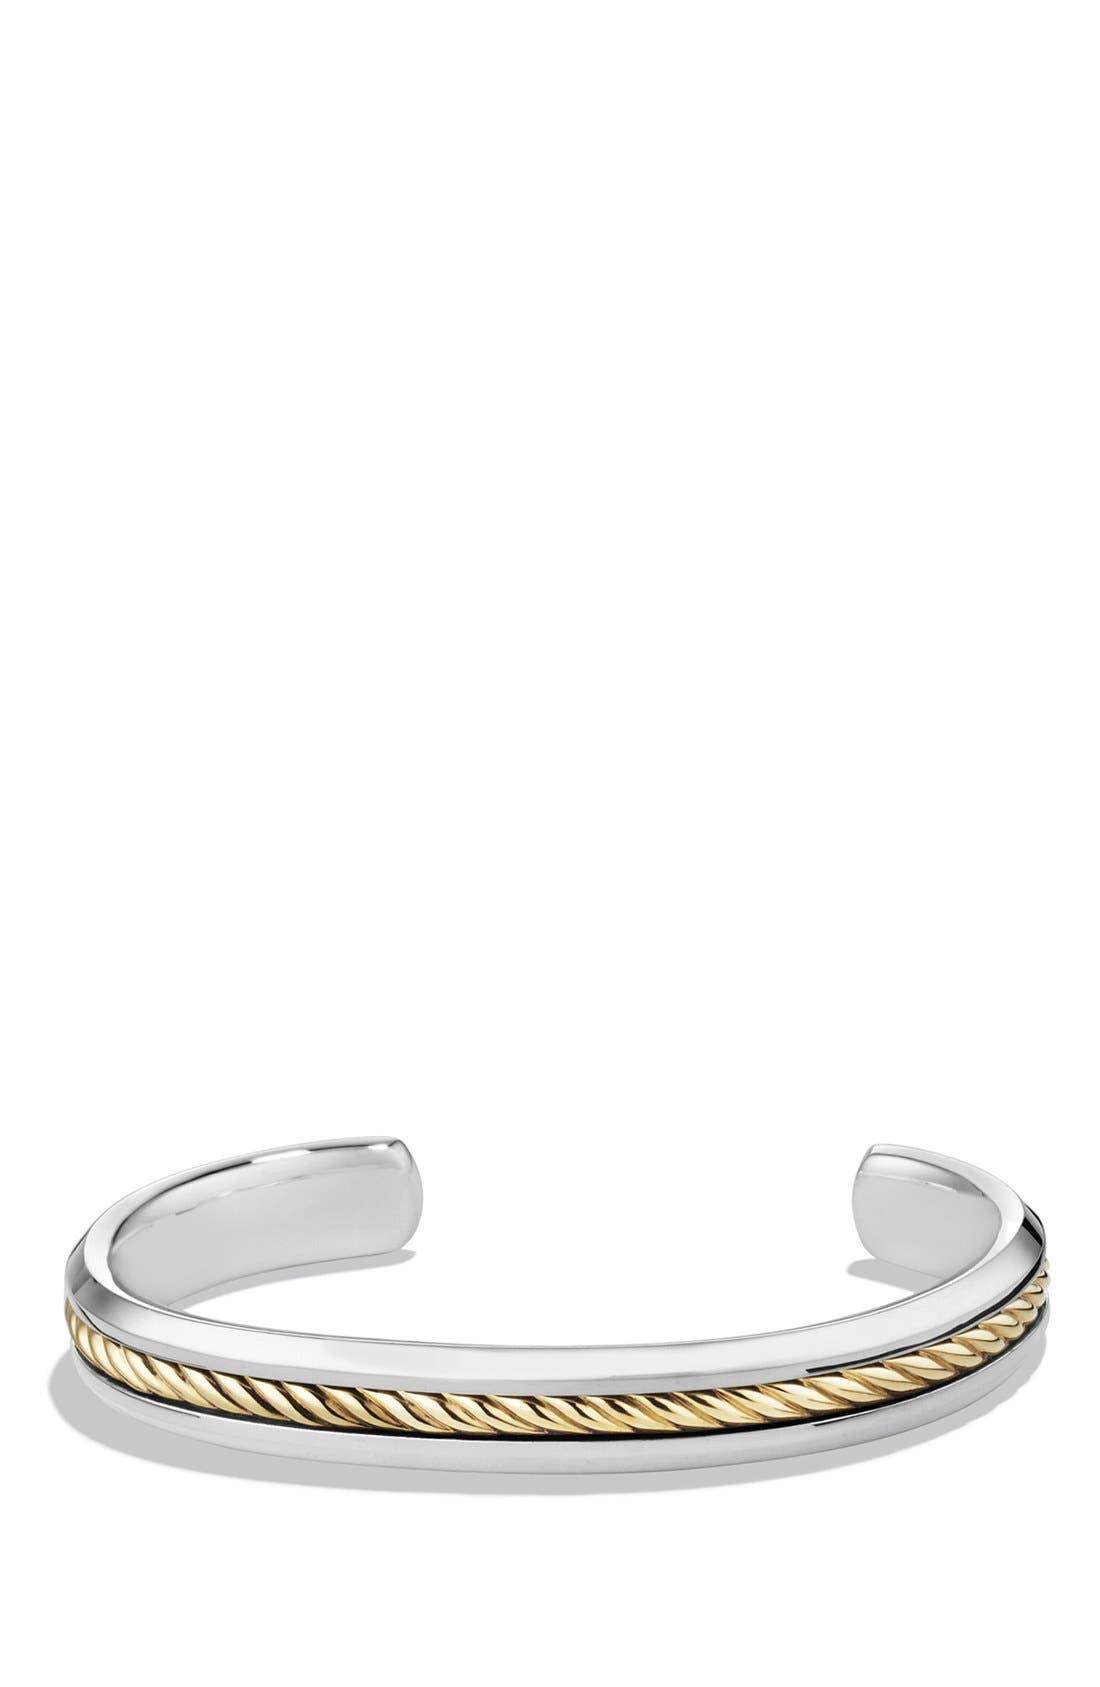 Main Image - David Yurman 'Cable Classics' Cuff Bracelet with Gold